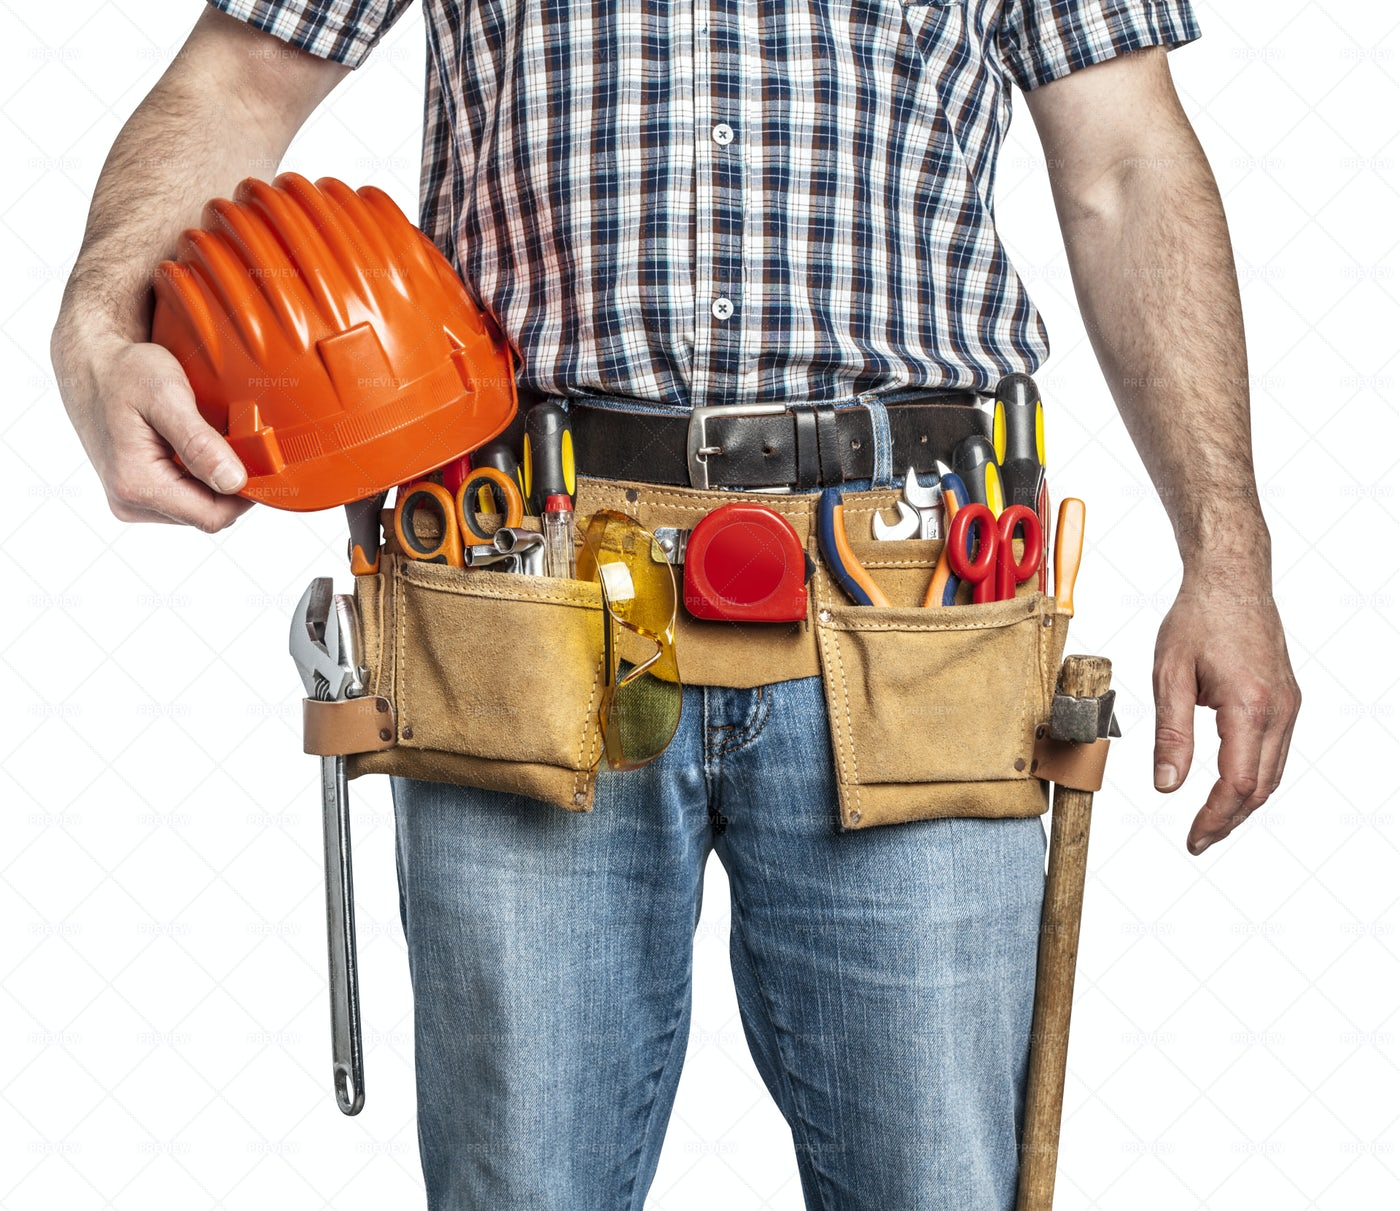 Handyman And Toolbelt Detail: Stock Photos